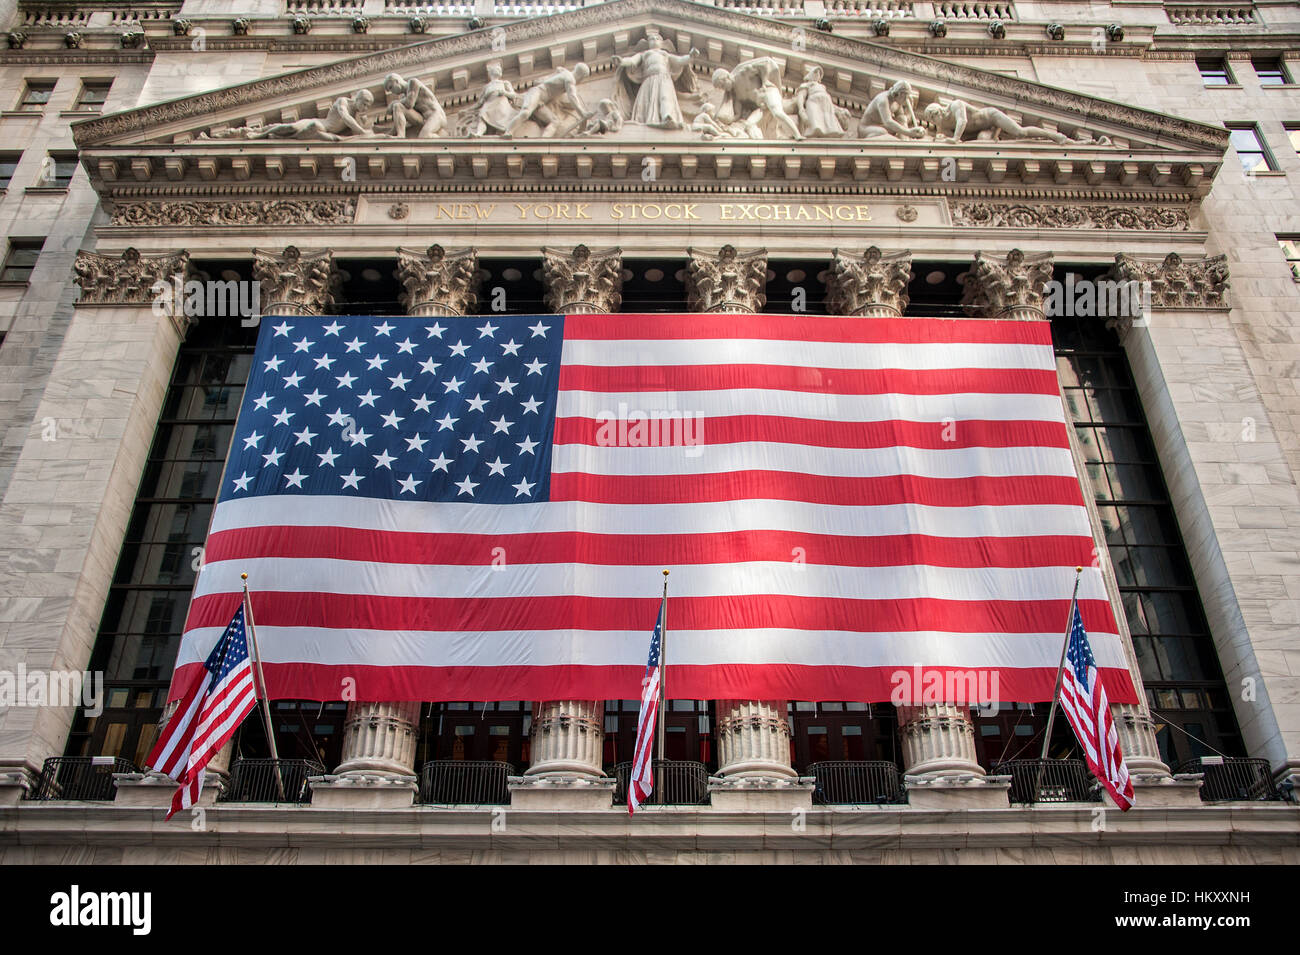 American flags on New York Stock Exchange, Stock Exchange, Wall Street, Manhattan, New York City, United States - Stock Image